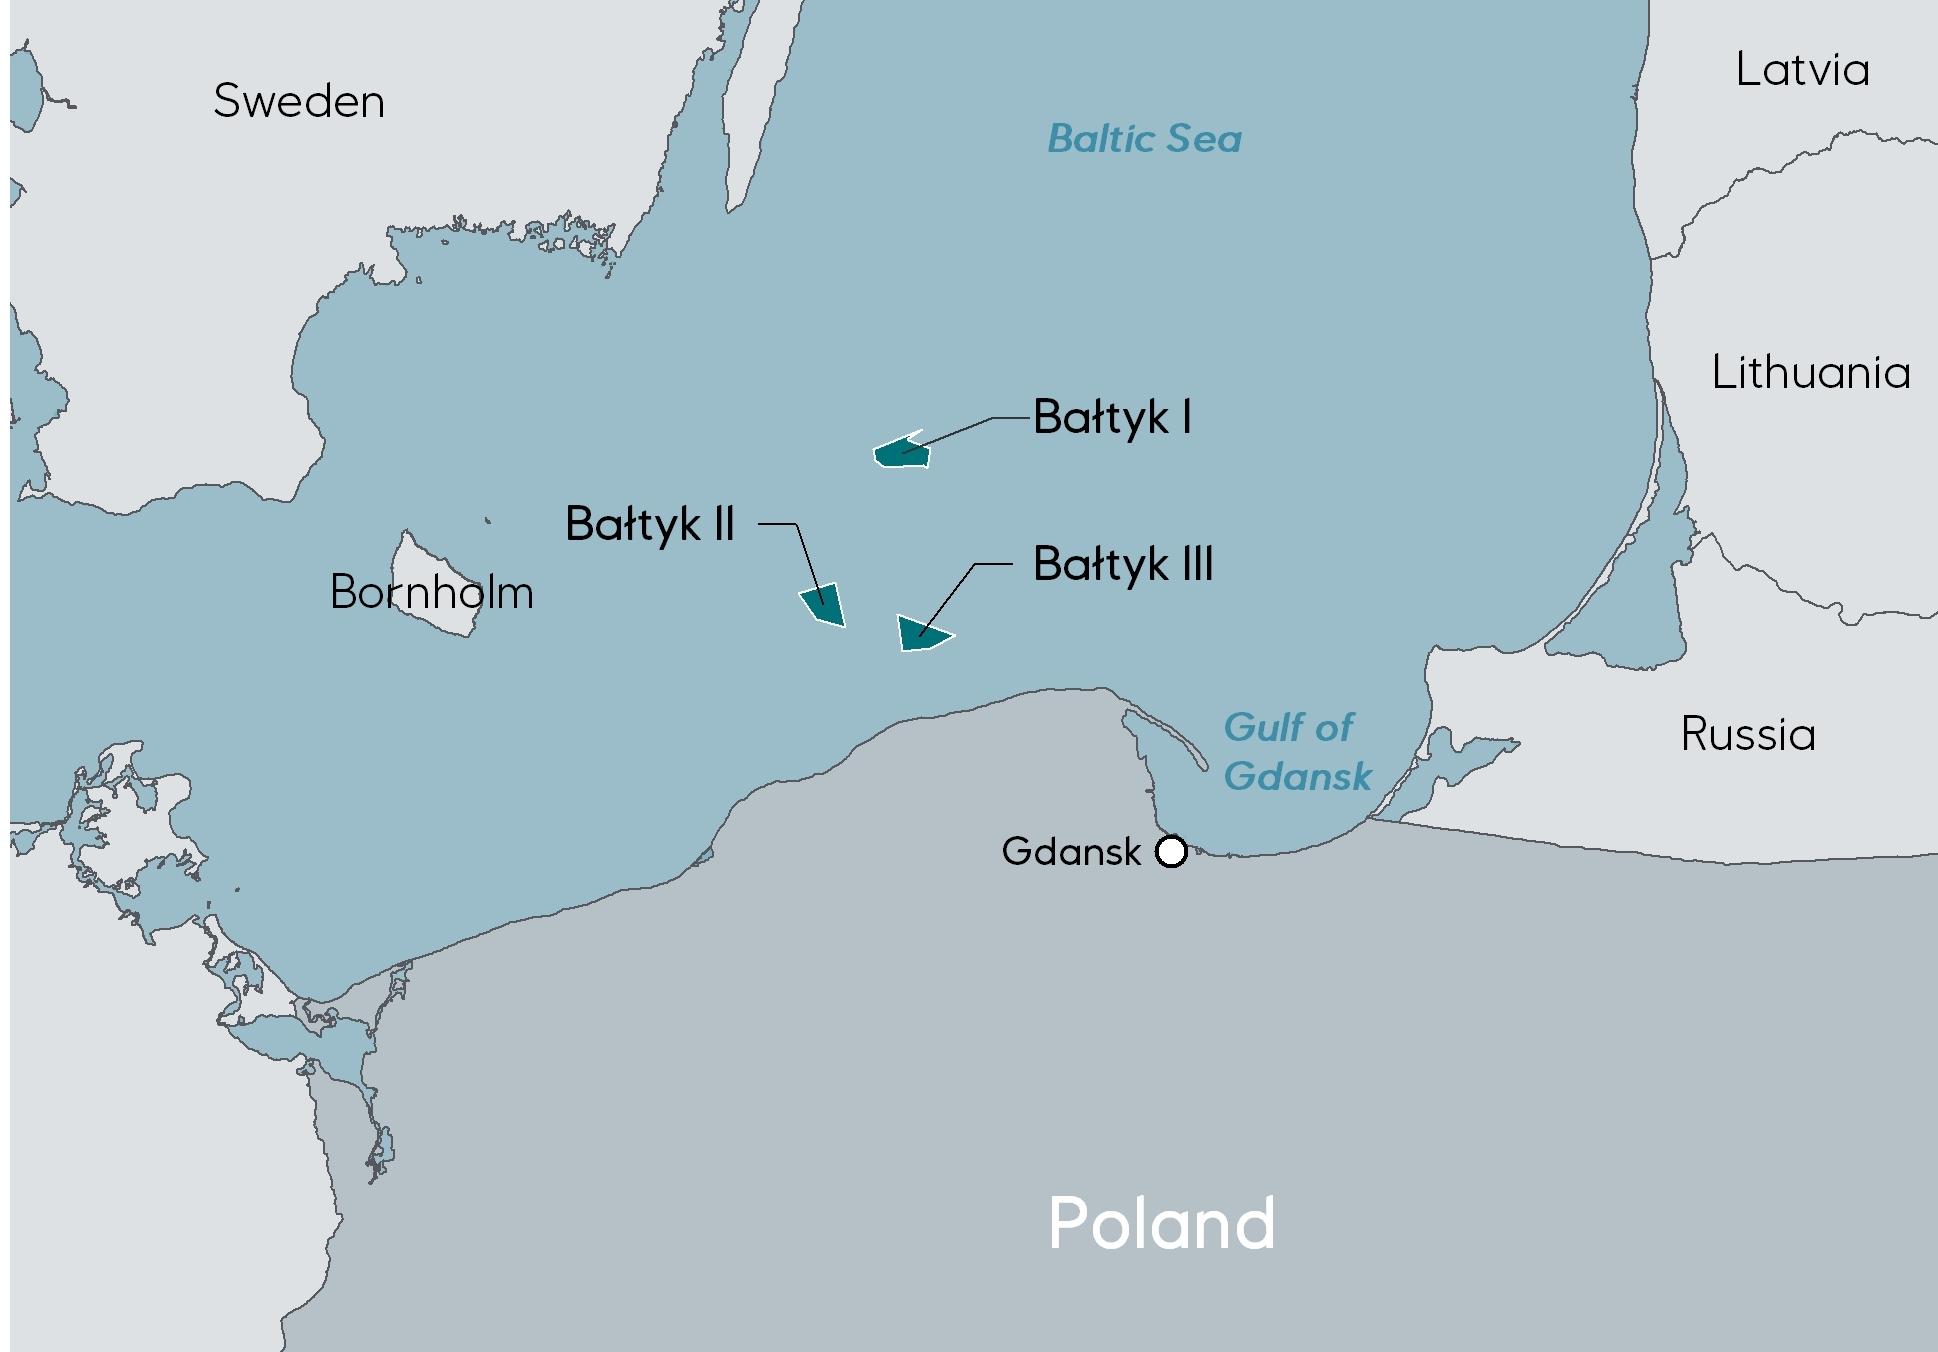 Equinor Polish wind project map.